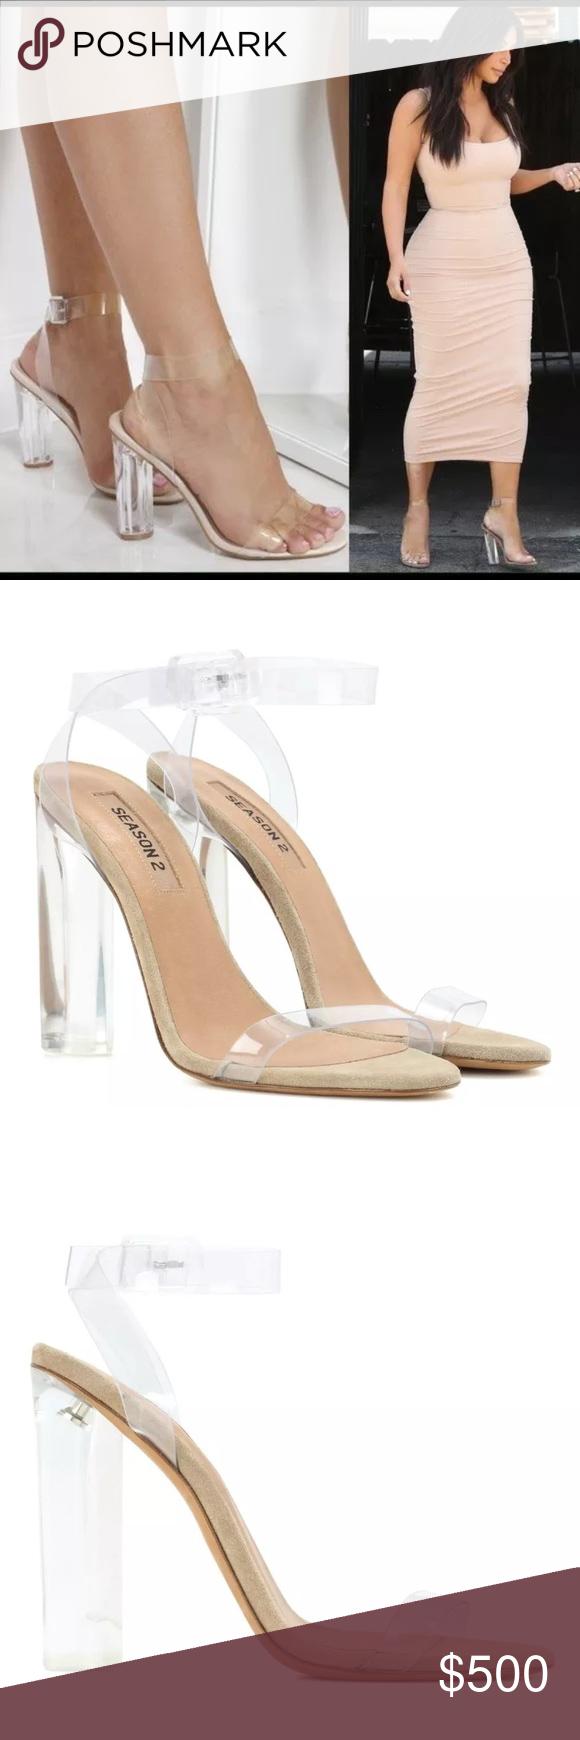 0b68a9e48 Season 2 Yeezy s Lucite sandal heels size 37 BN Brand new Season 2 Yeezy  sandal heels